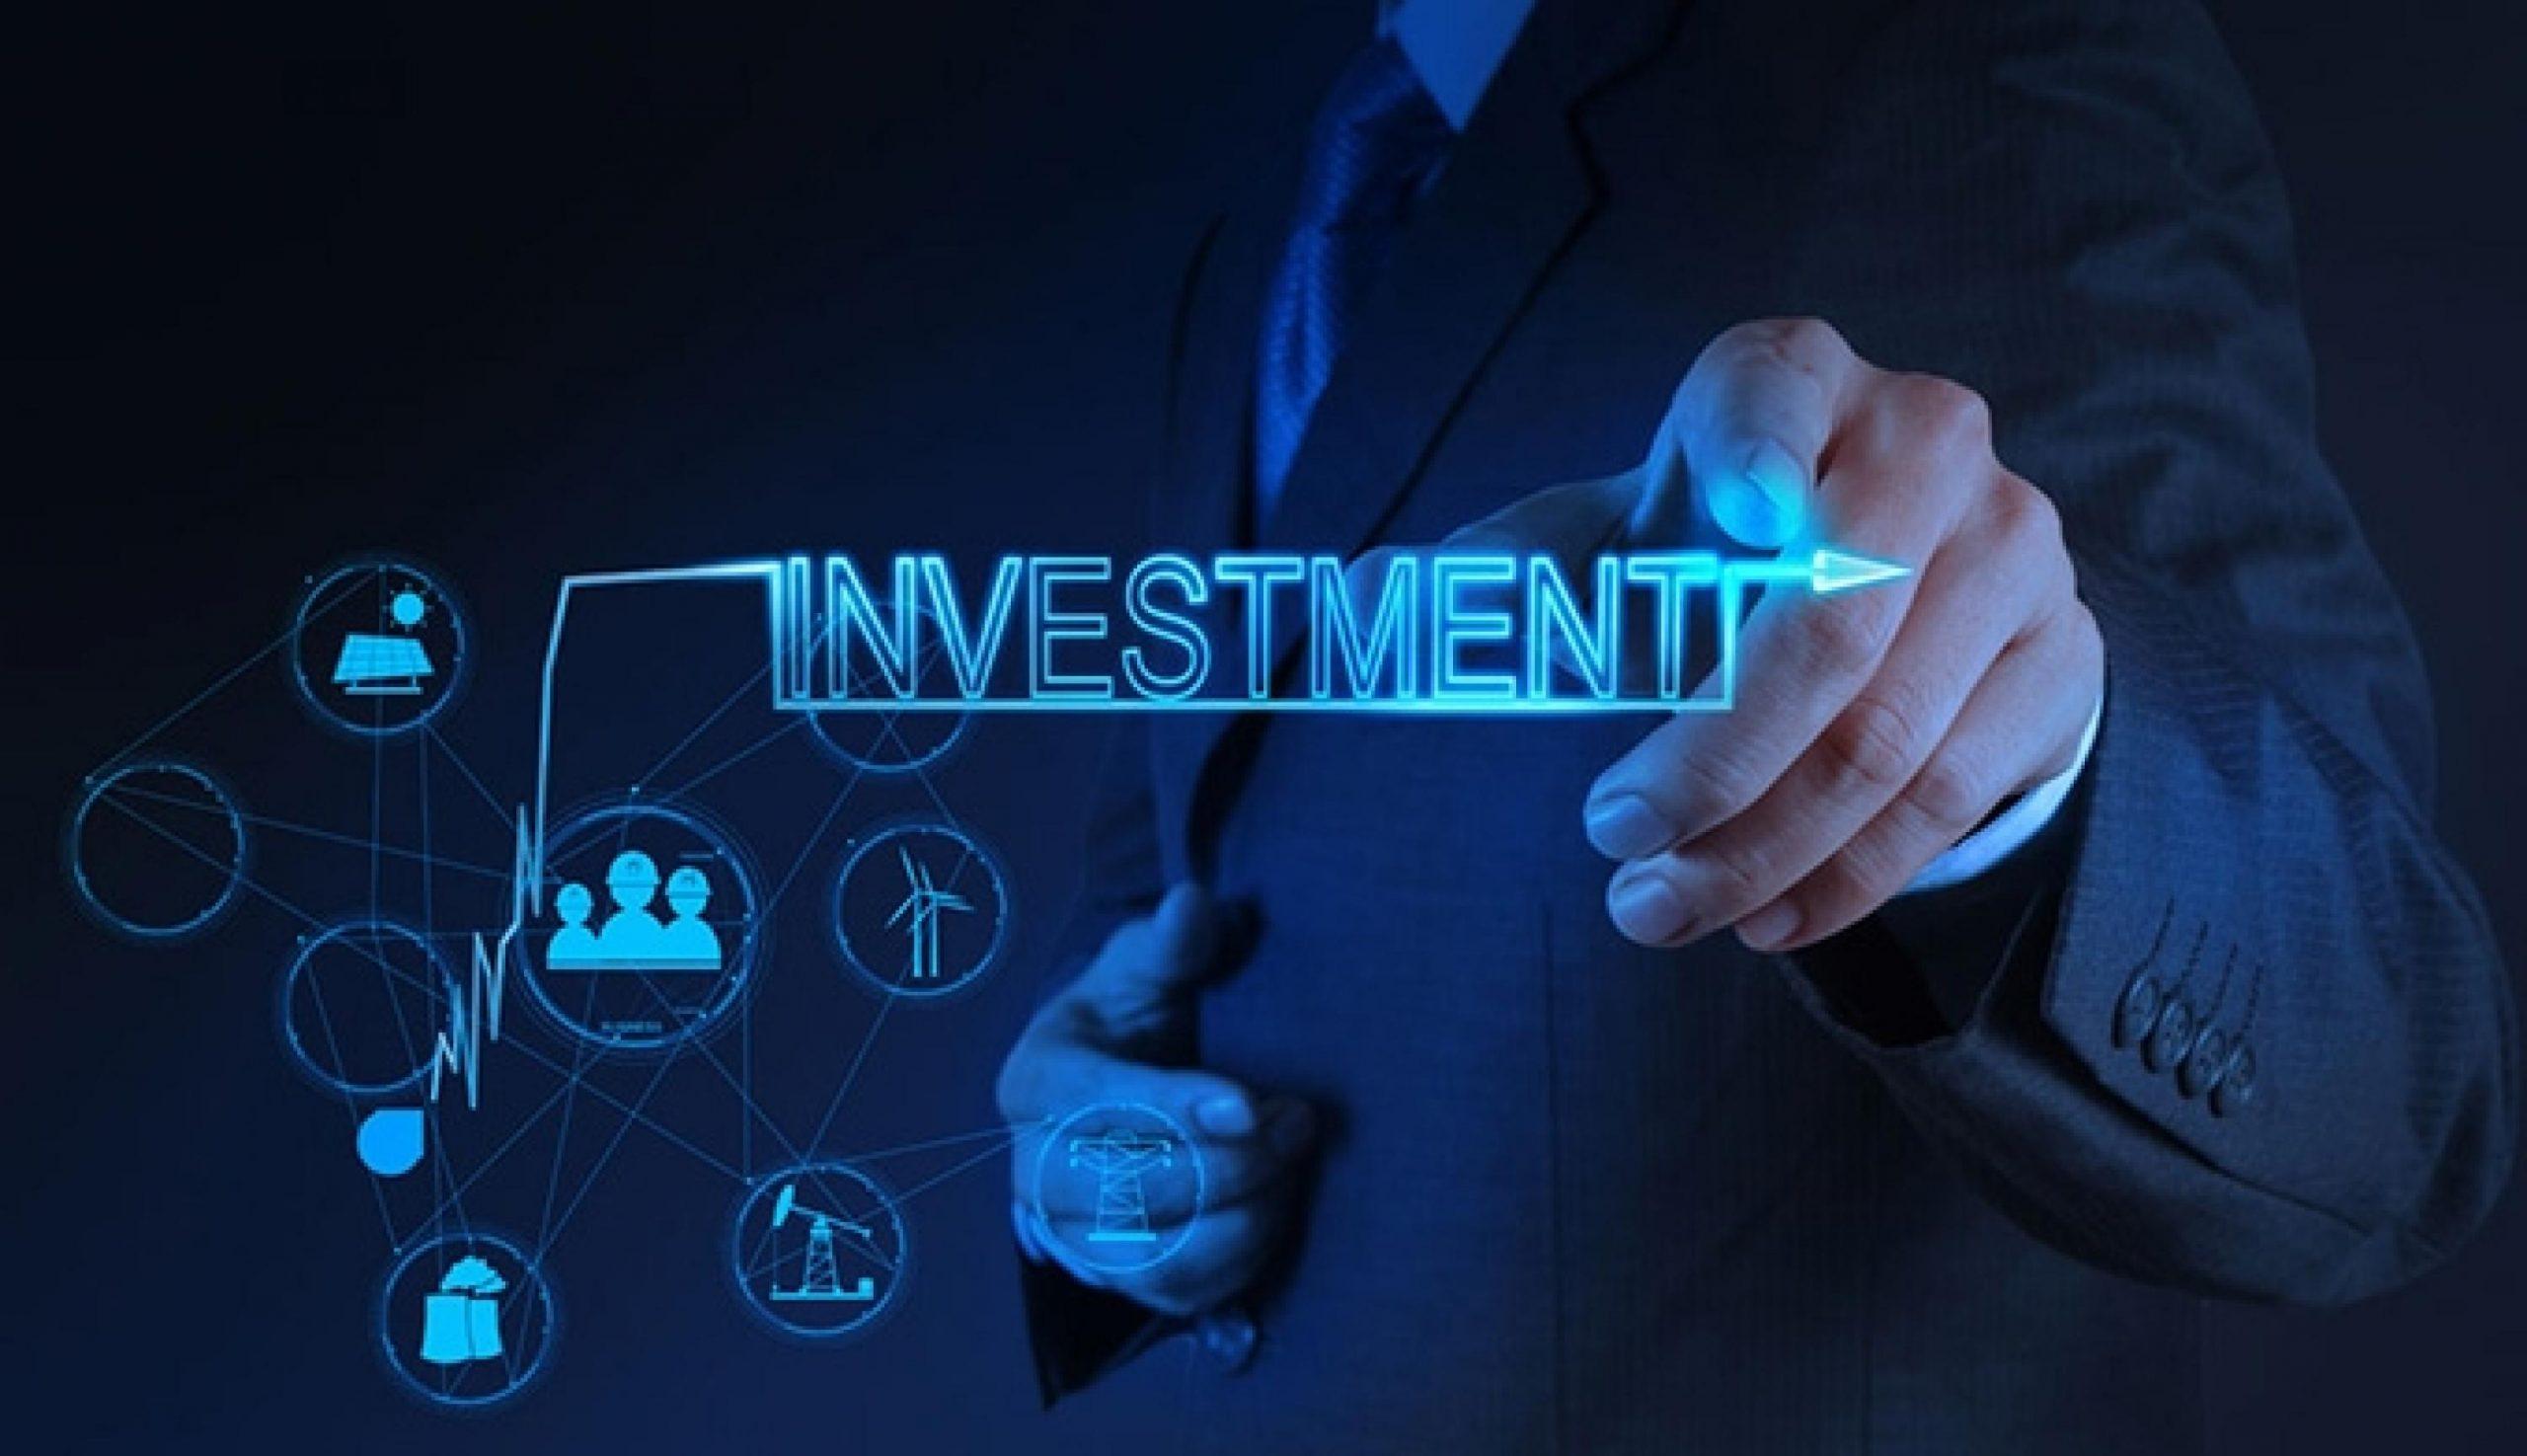 BOI Investment